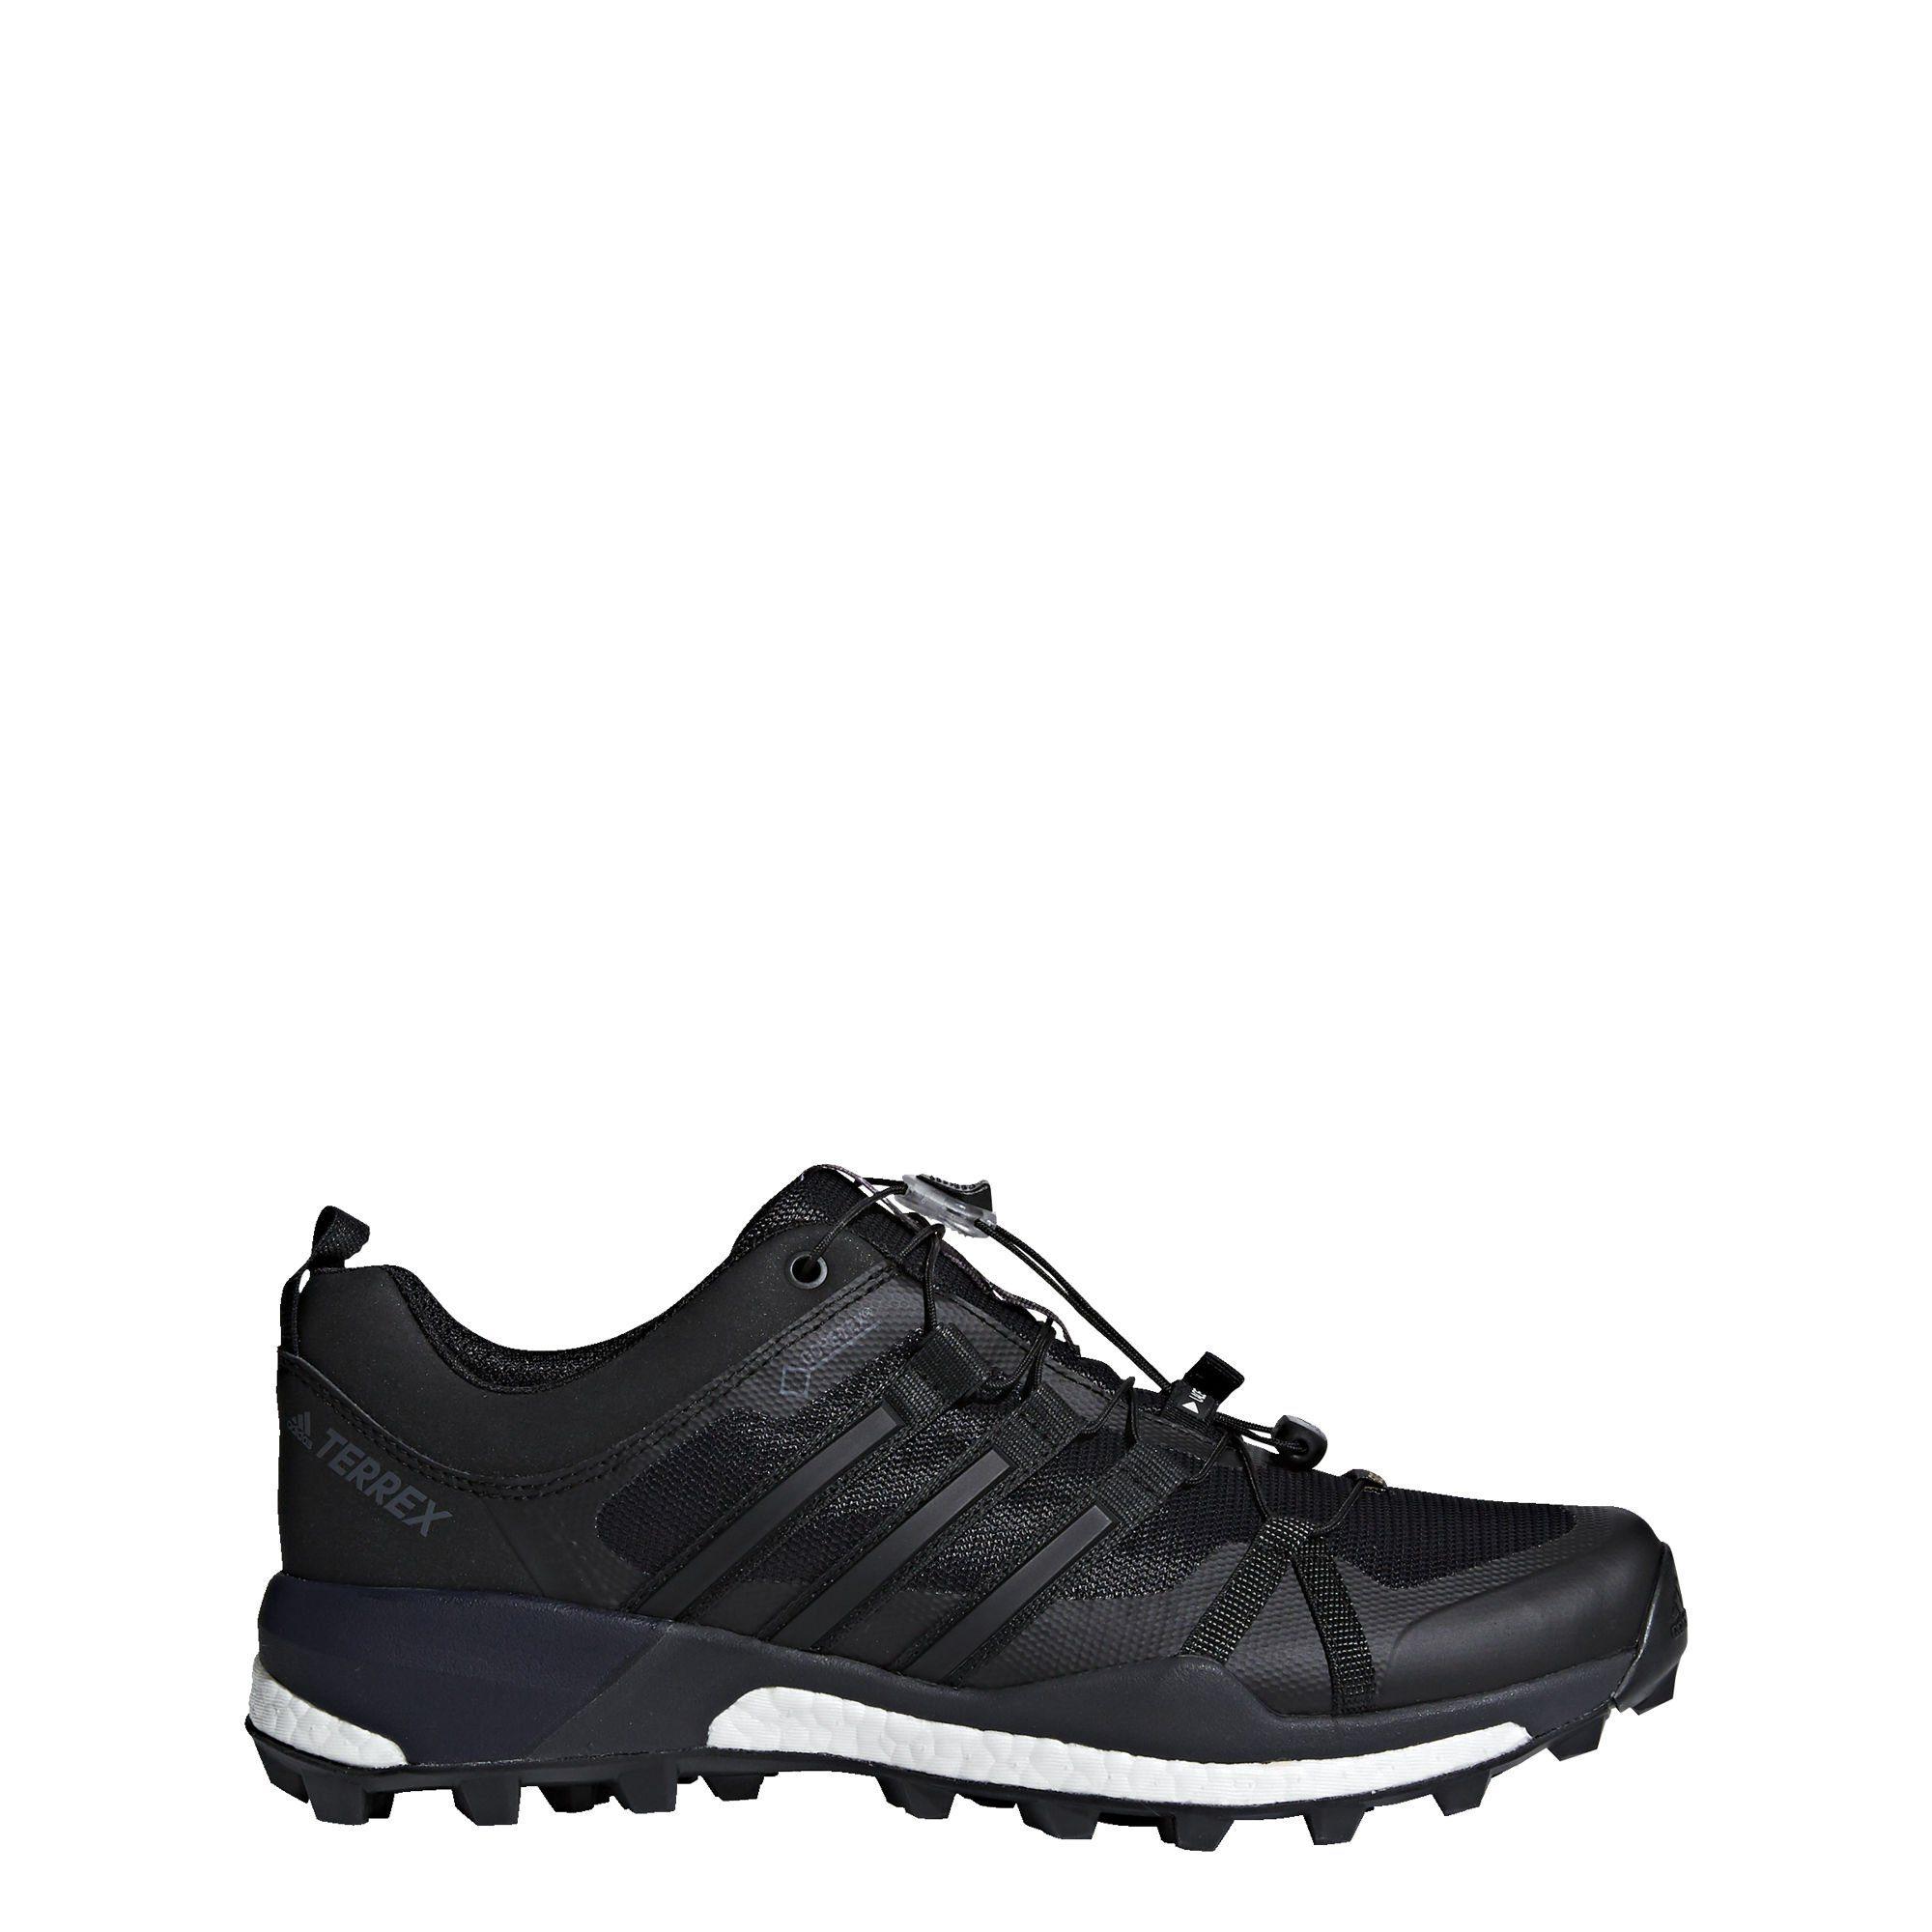 adidas Performance »TERREX Skychaser GTX Schuh« Outdoorschuh Outdoorschuh online kaufen   OTTO